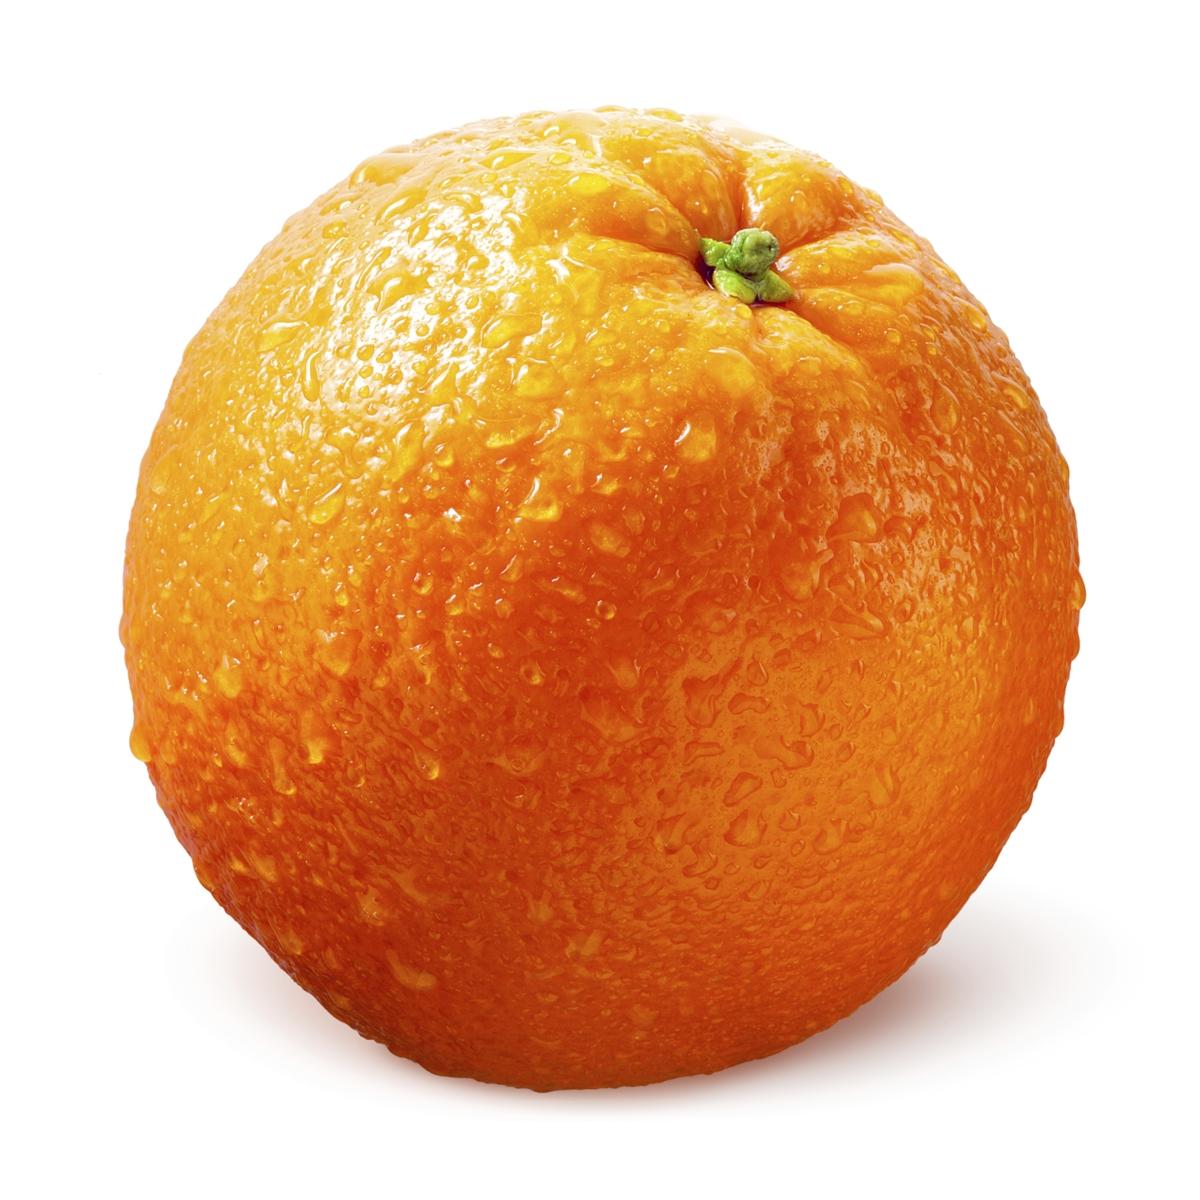 1200-187108077-orange-fruit.jpg